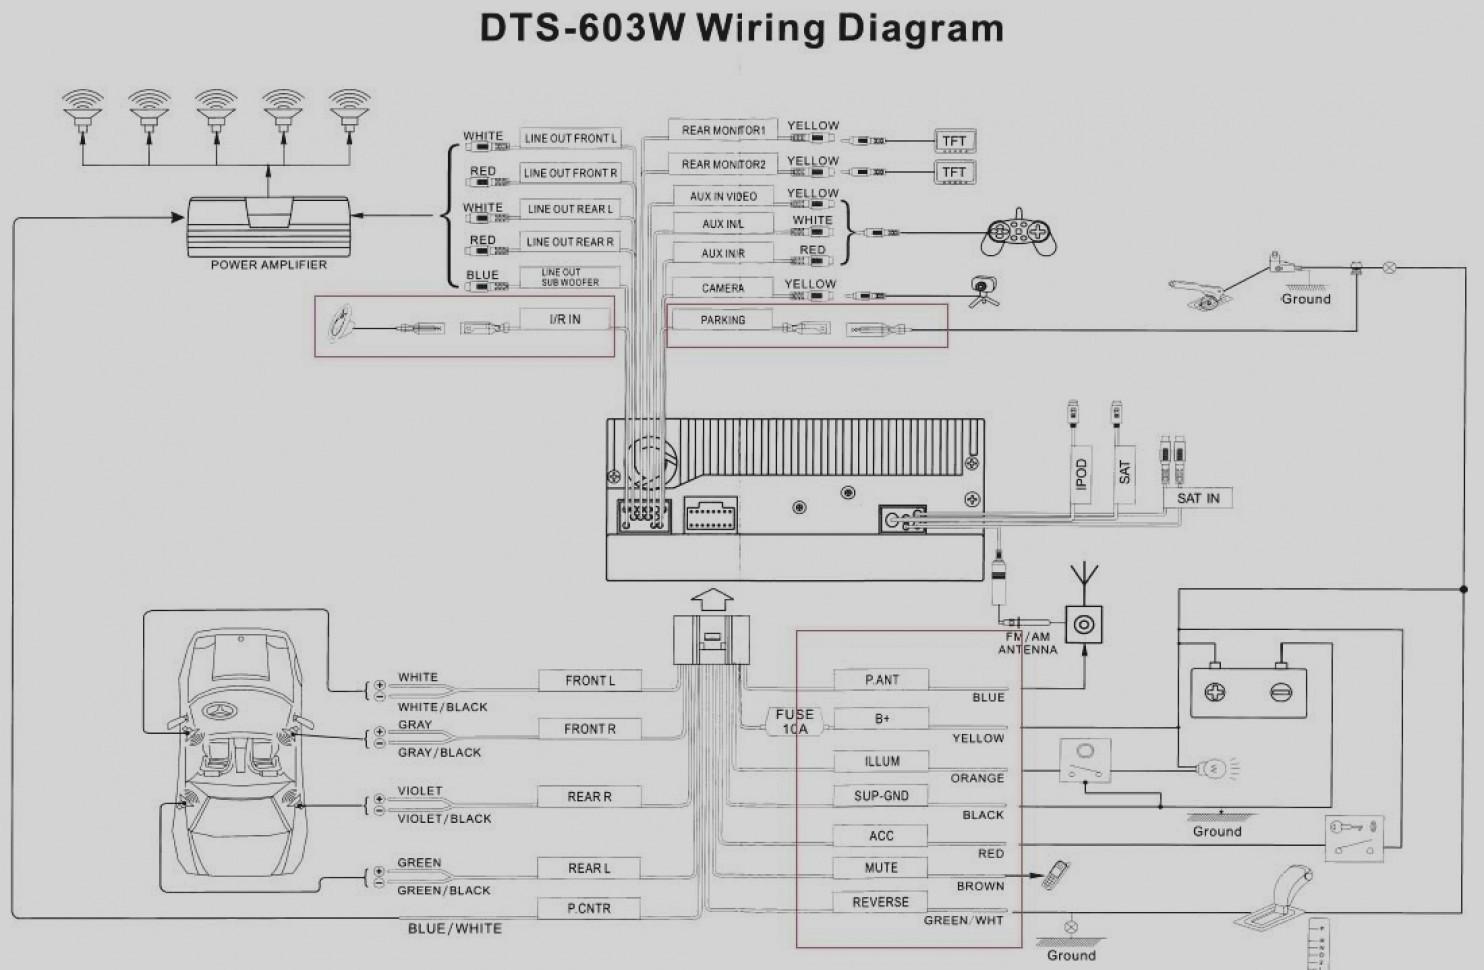 2003 chevy trailblazer wiring diagram rear example electrical rh labs labs4 fun 2005 Chevy Trailblazer Wiring Diagram Wiring Harness for 2007 Trailblazer